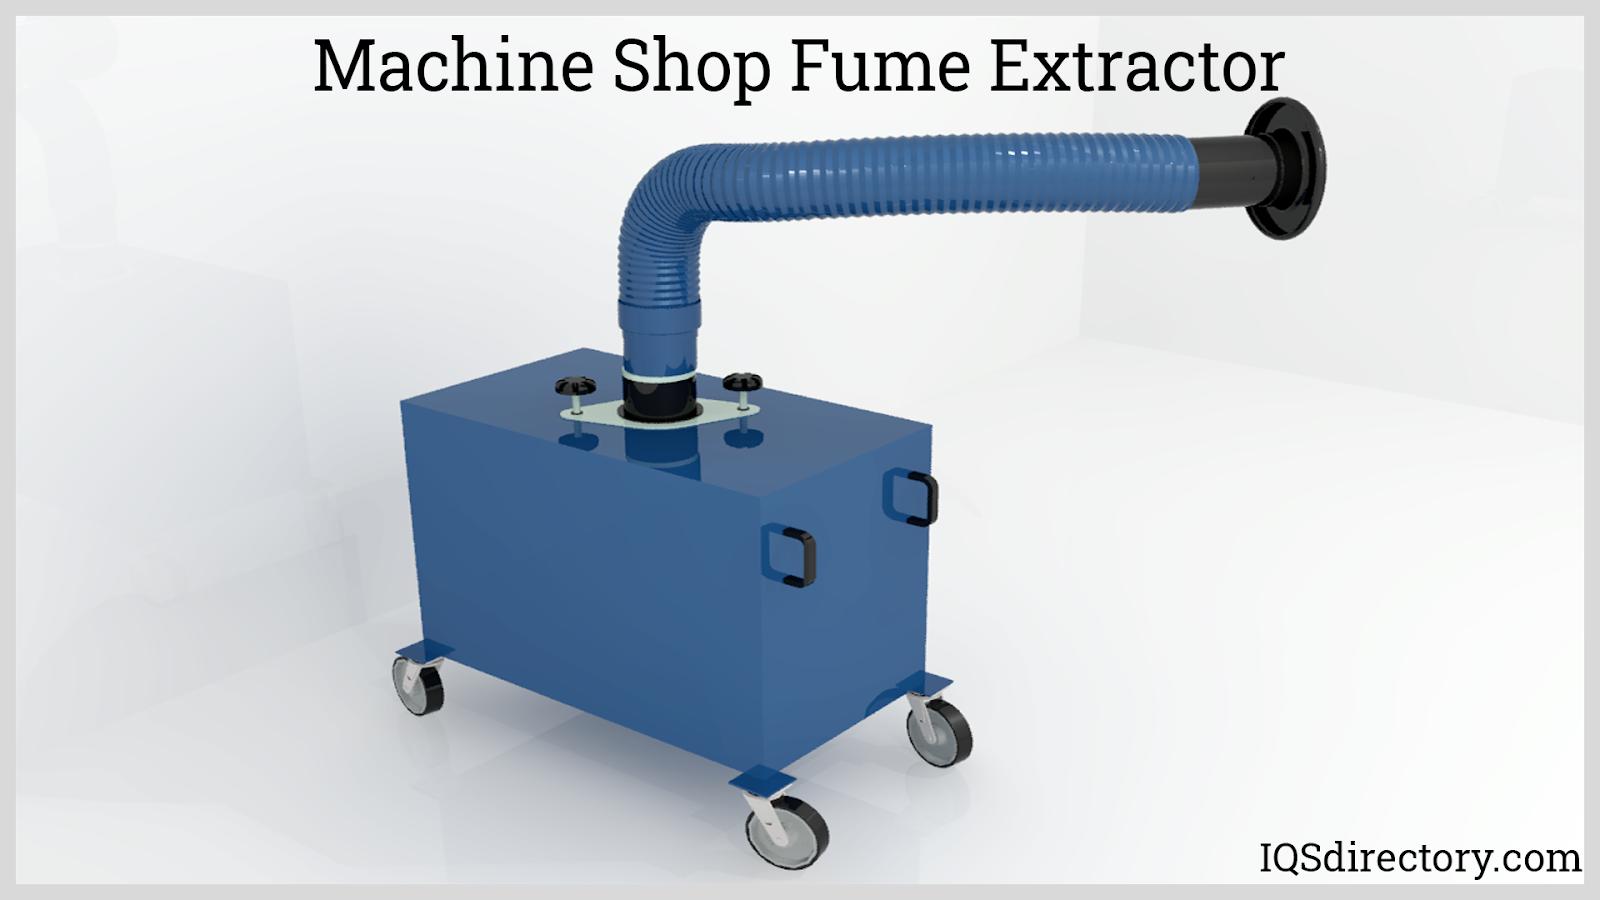 Machine Shop Fume Extractor